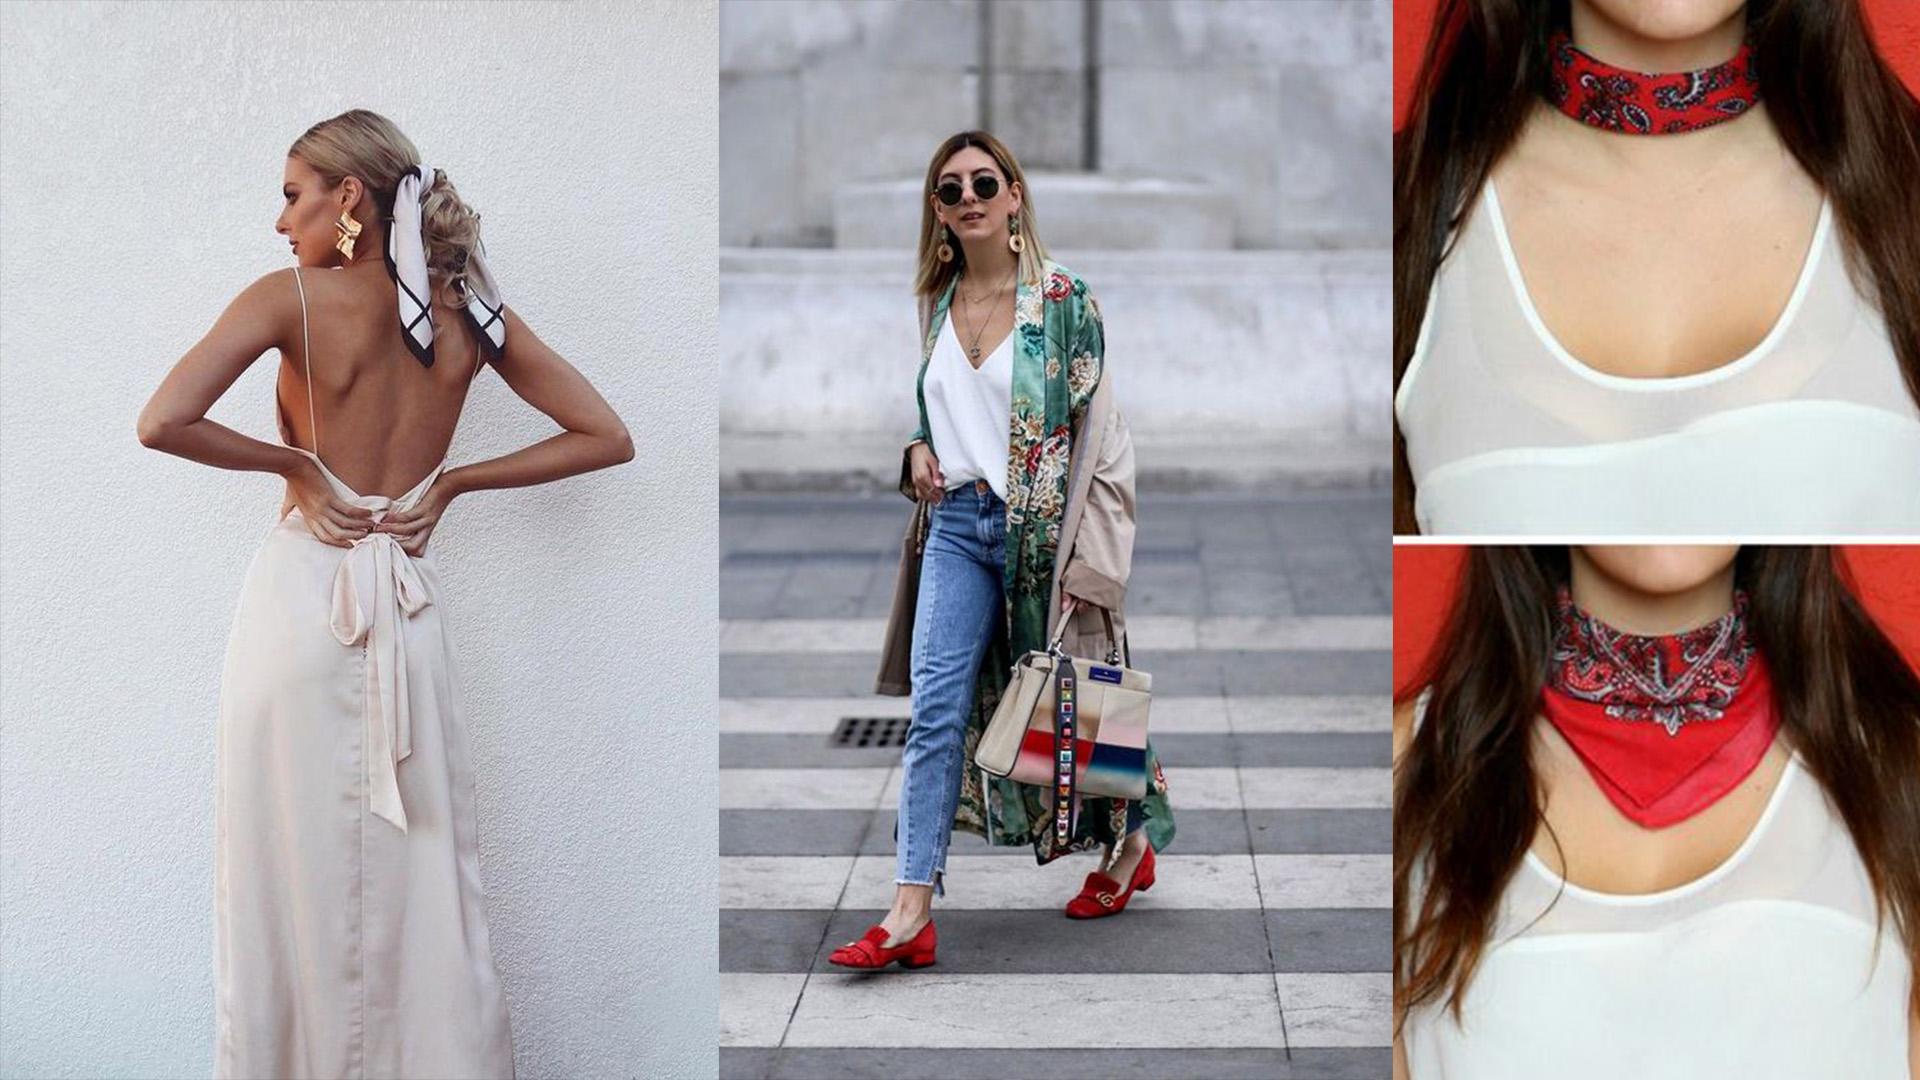 modni trikovi stilista